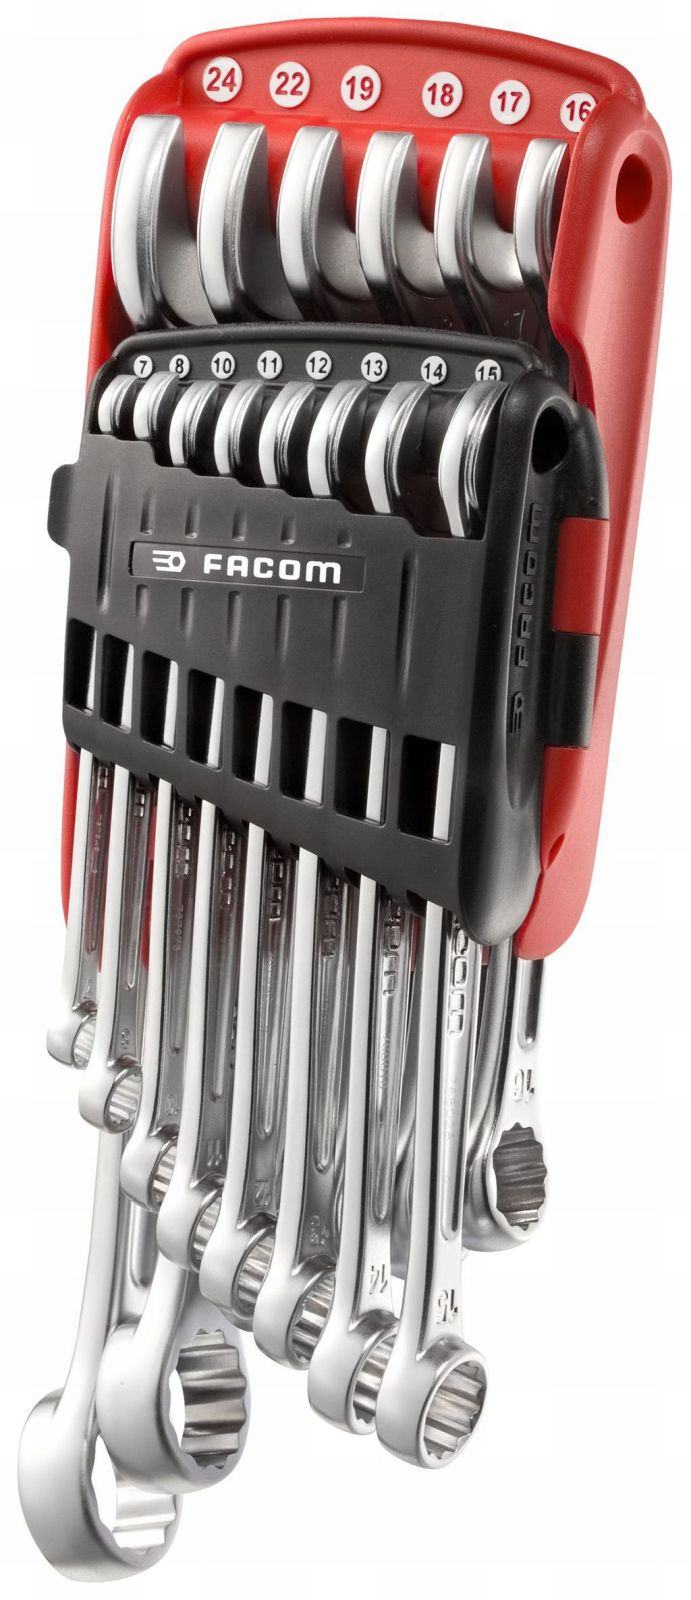 FACOM Profi  Ringmaulschlüssel Maulringschlüssel  7 bis 24mm  14 tlg mit Halter